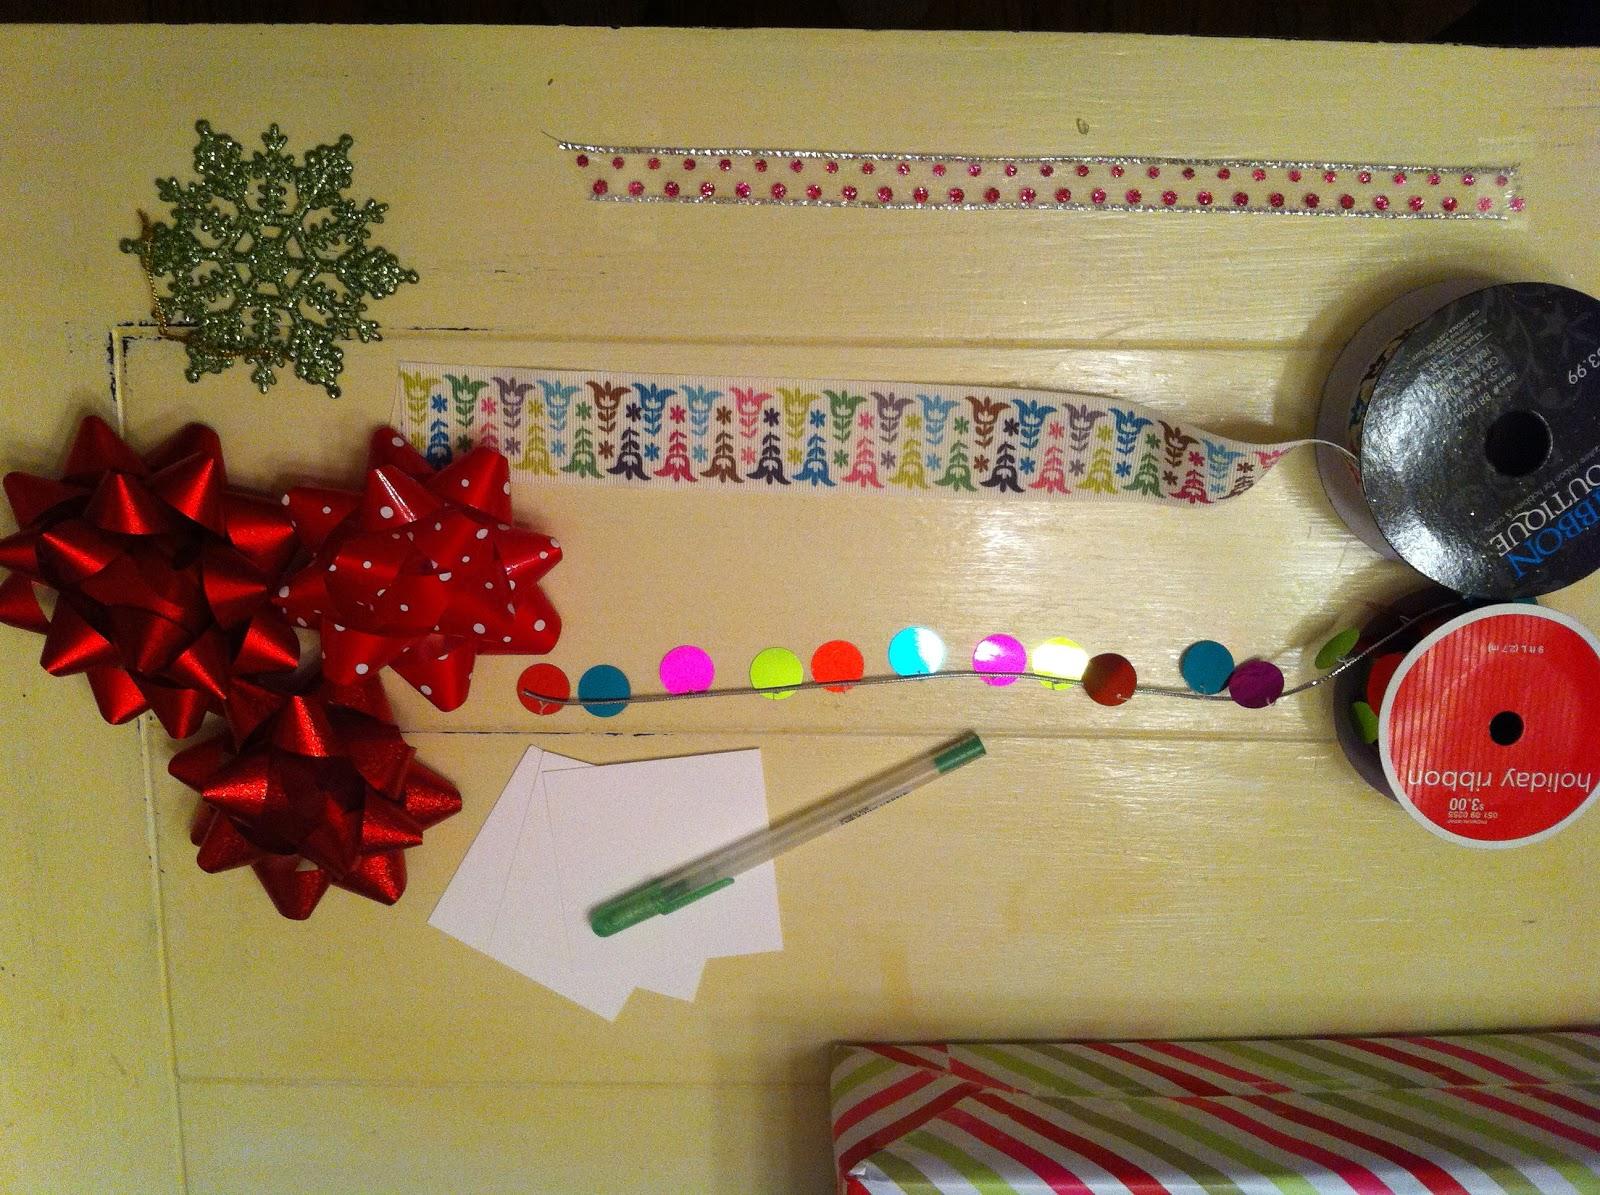 http://1.bp.blogspot.com/_TCIwdfNUpf4/TQ2UfYAMcrI/AAAAAAAAAek/cP-3QbfQpmU/s1600/gifts+3.JPG